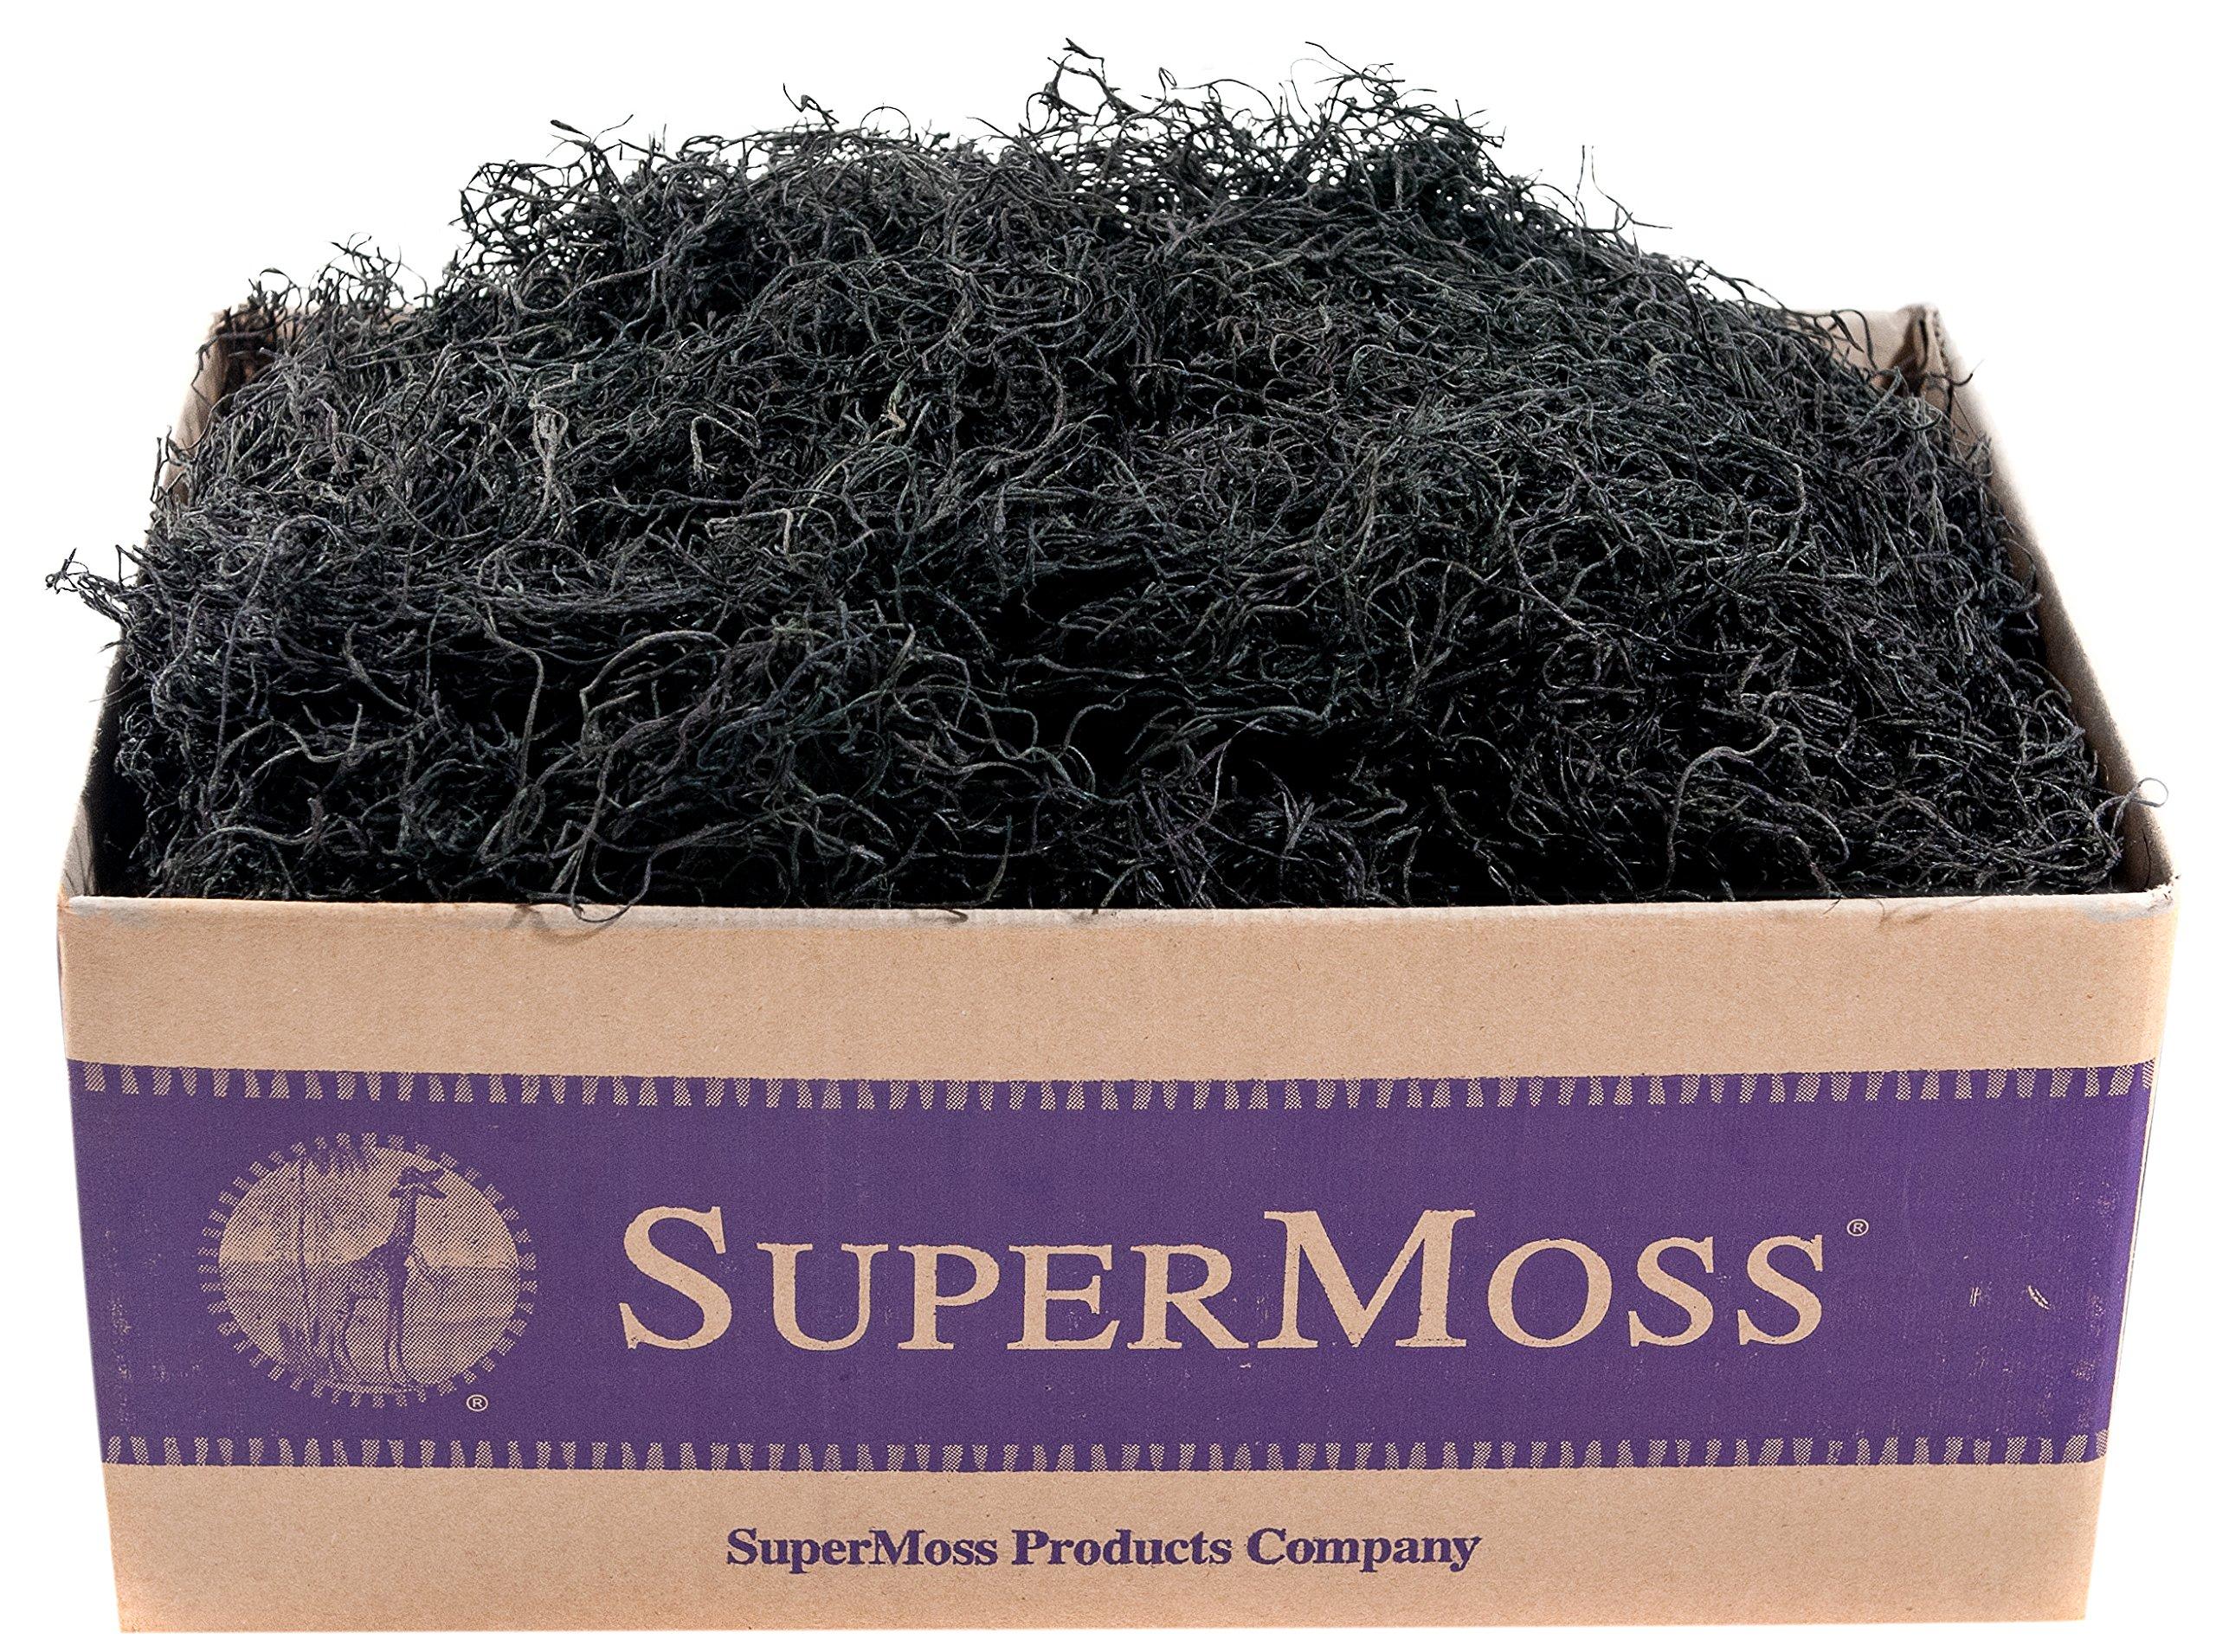 SuperMoss (27017) Spanish Moss Preserved, Black, 3lbs